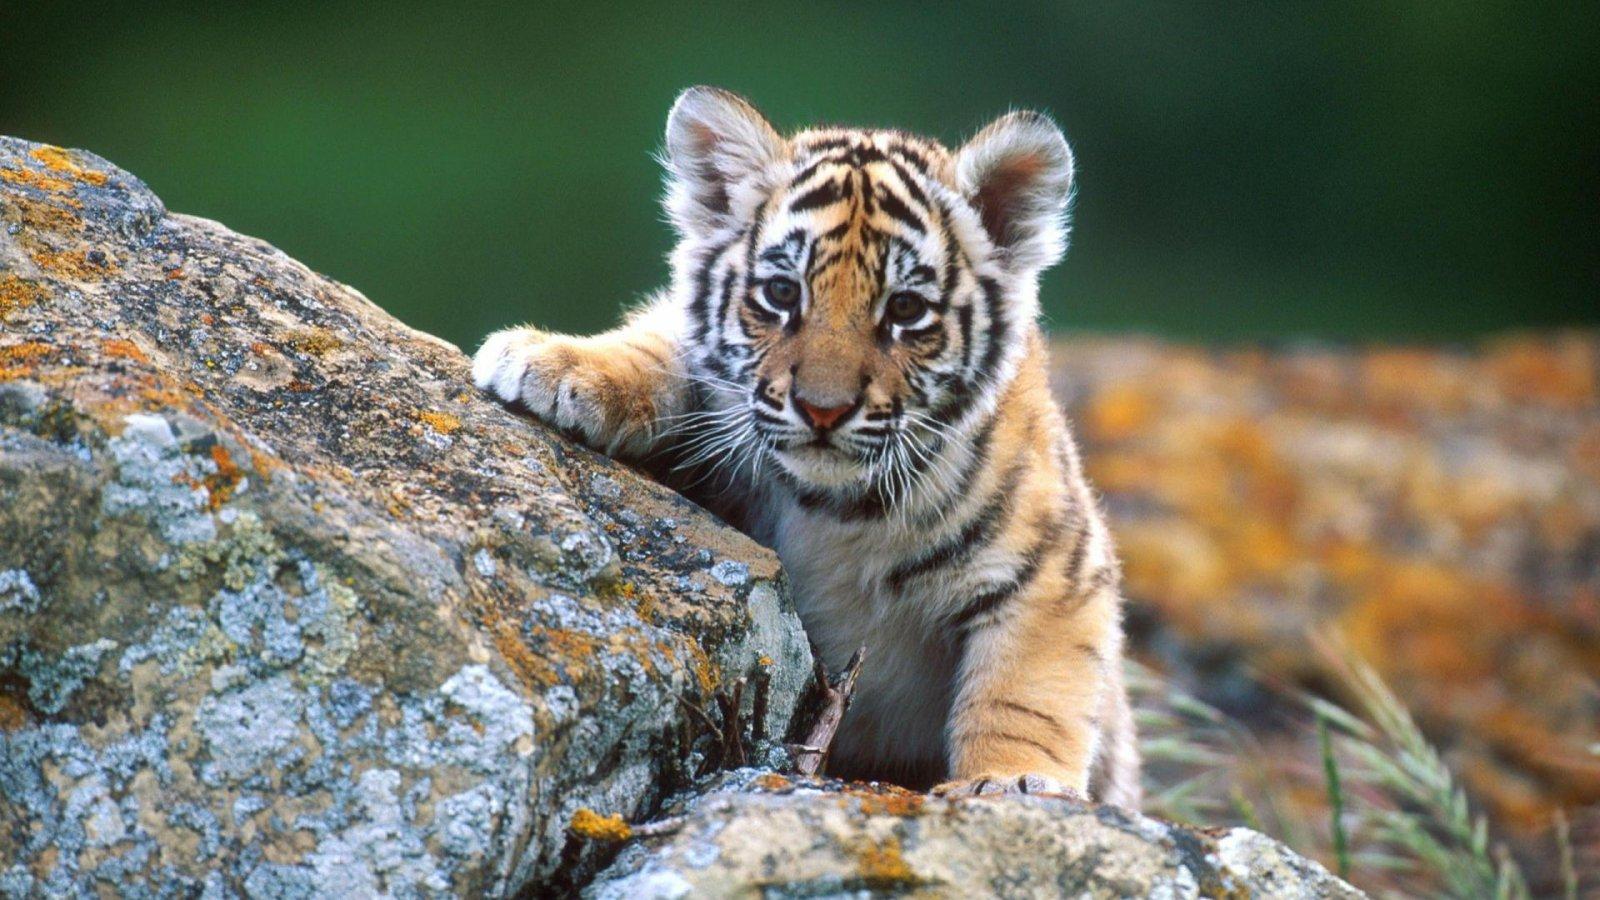 Free Download Hdej Desktop Wallpapers Tiger Baby Dieren